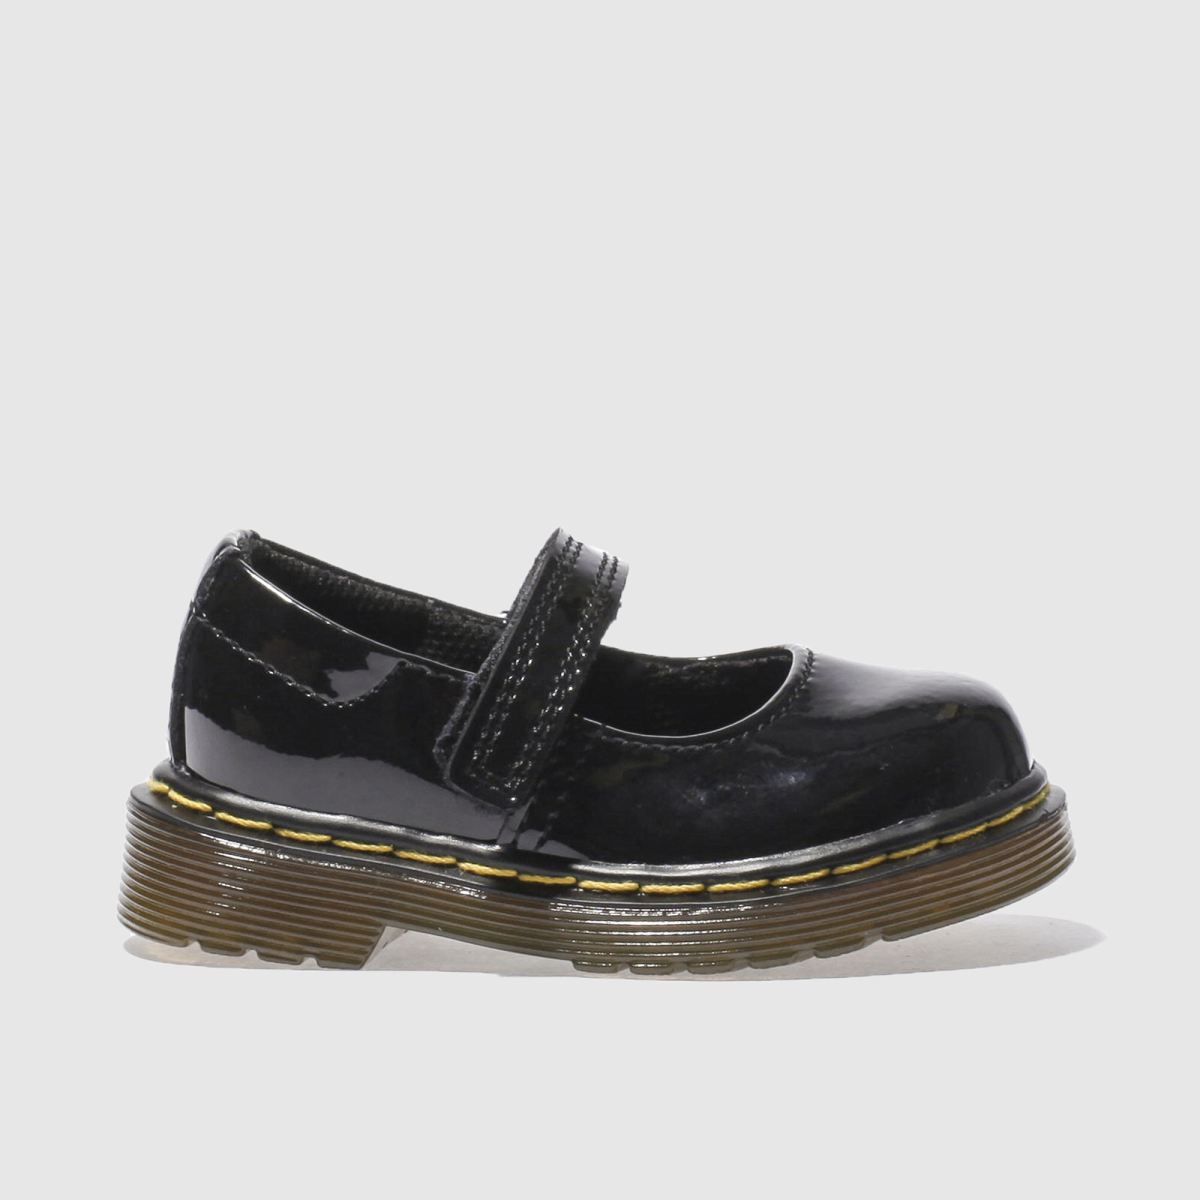 dr martens black tully Girls Toddler Shoes